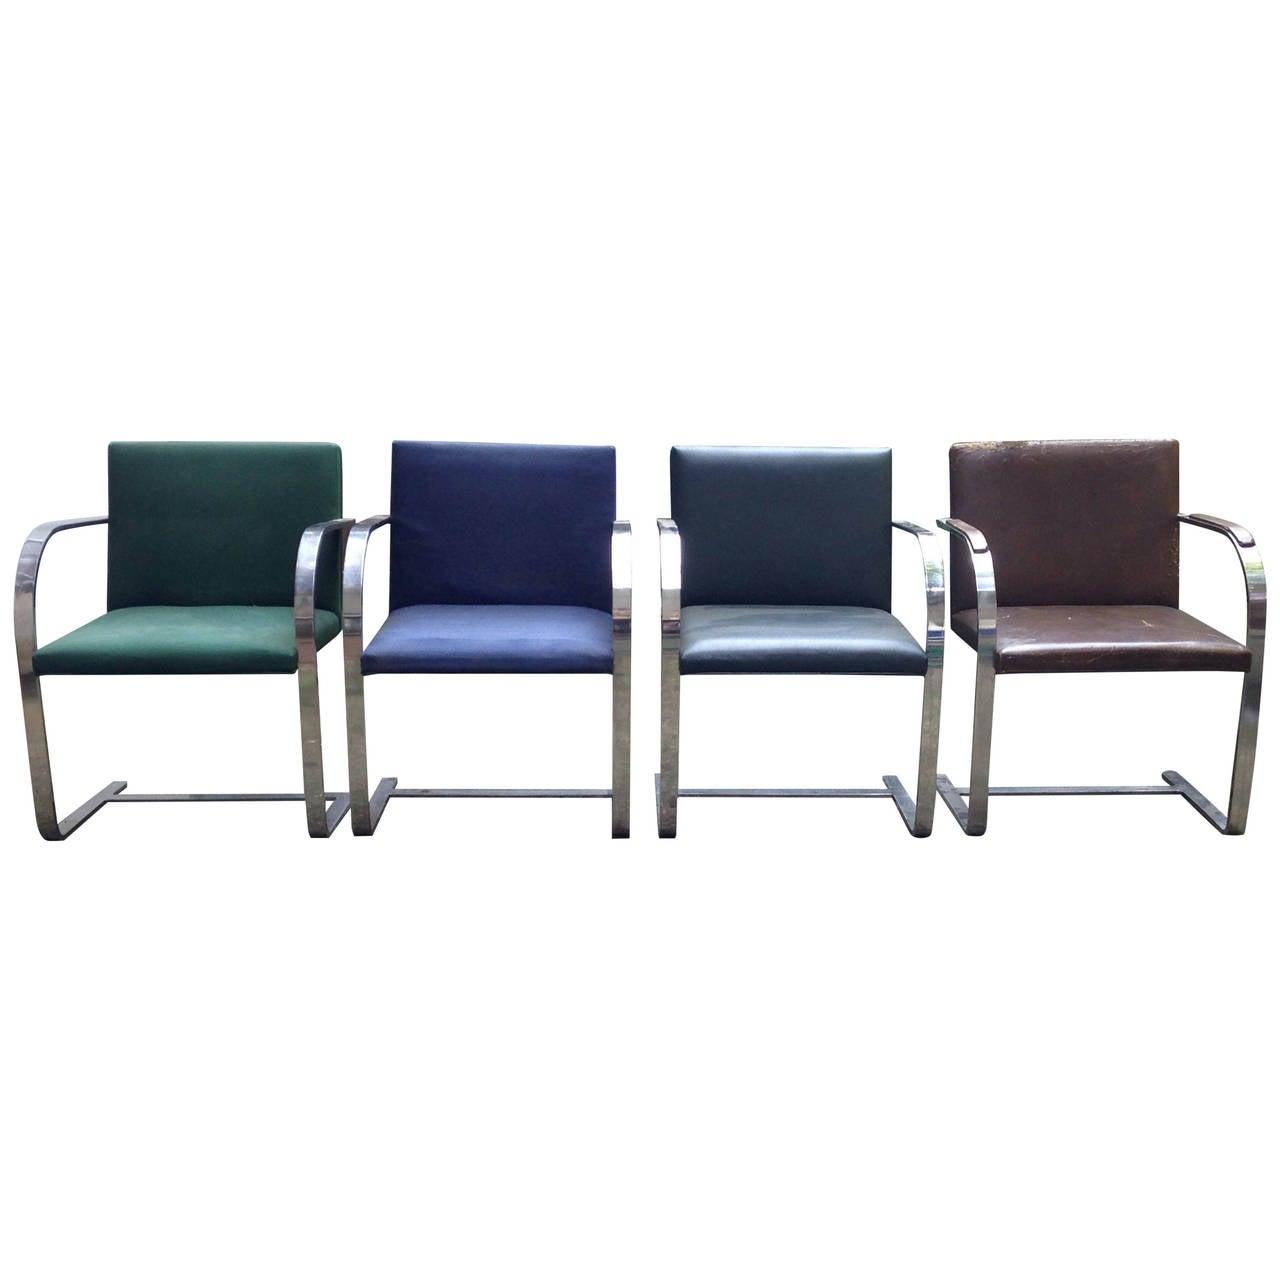 16 ludwig mies van der rohe flat bar brno chairs by knoll